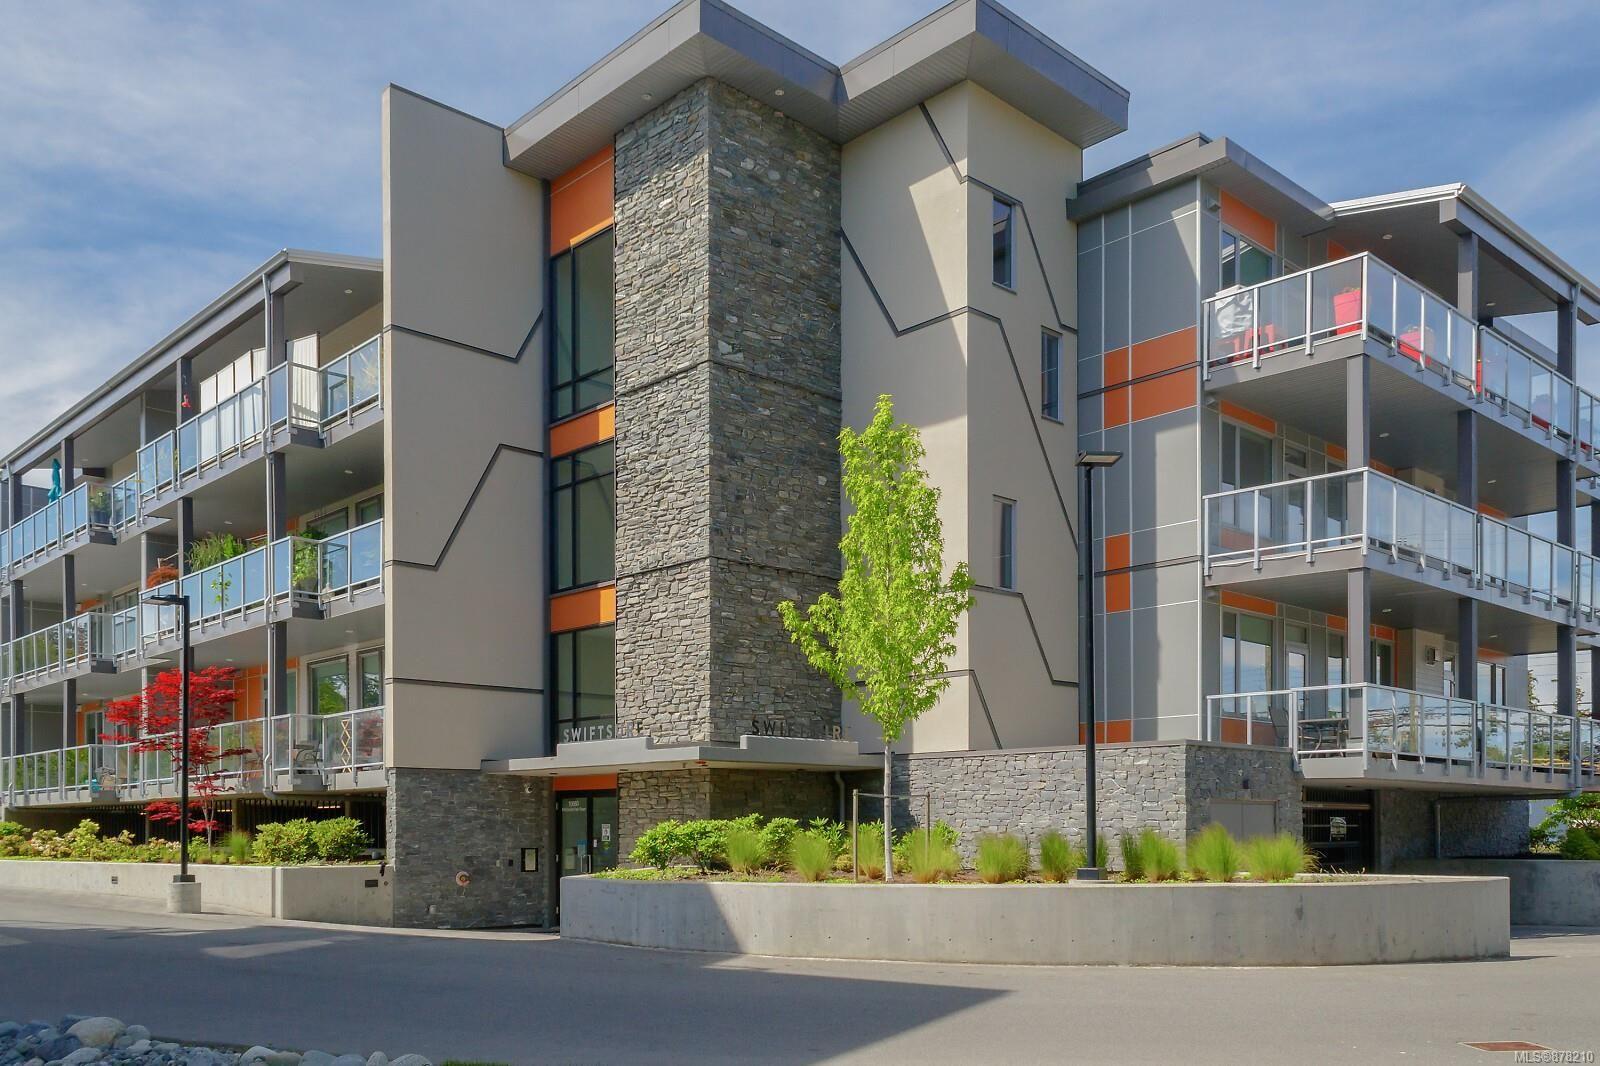 Main Photo: 301 10680 McDonald Park Rd in : NS McDonald Park Condo for sale (North Saanich)  : MLS®# 878210